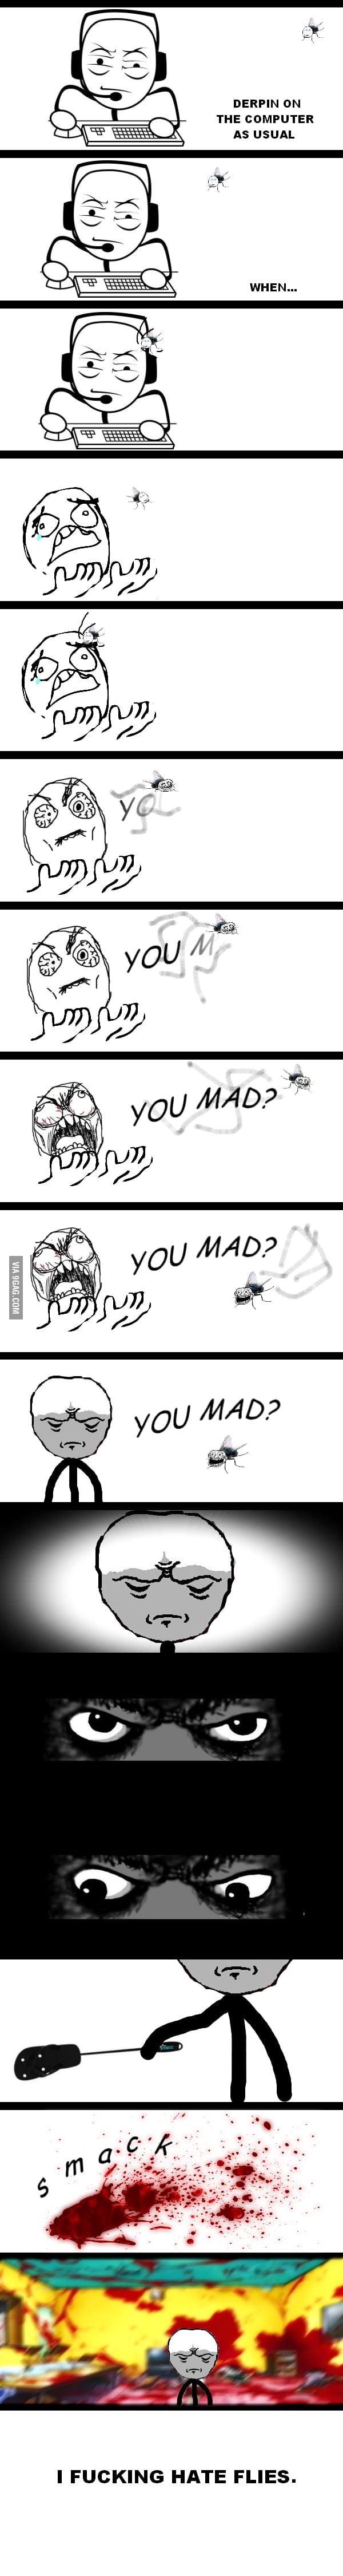 I hate flies